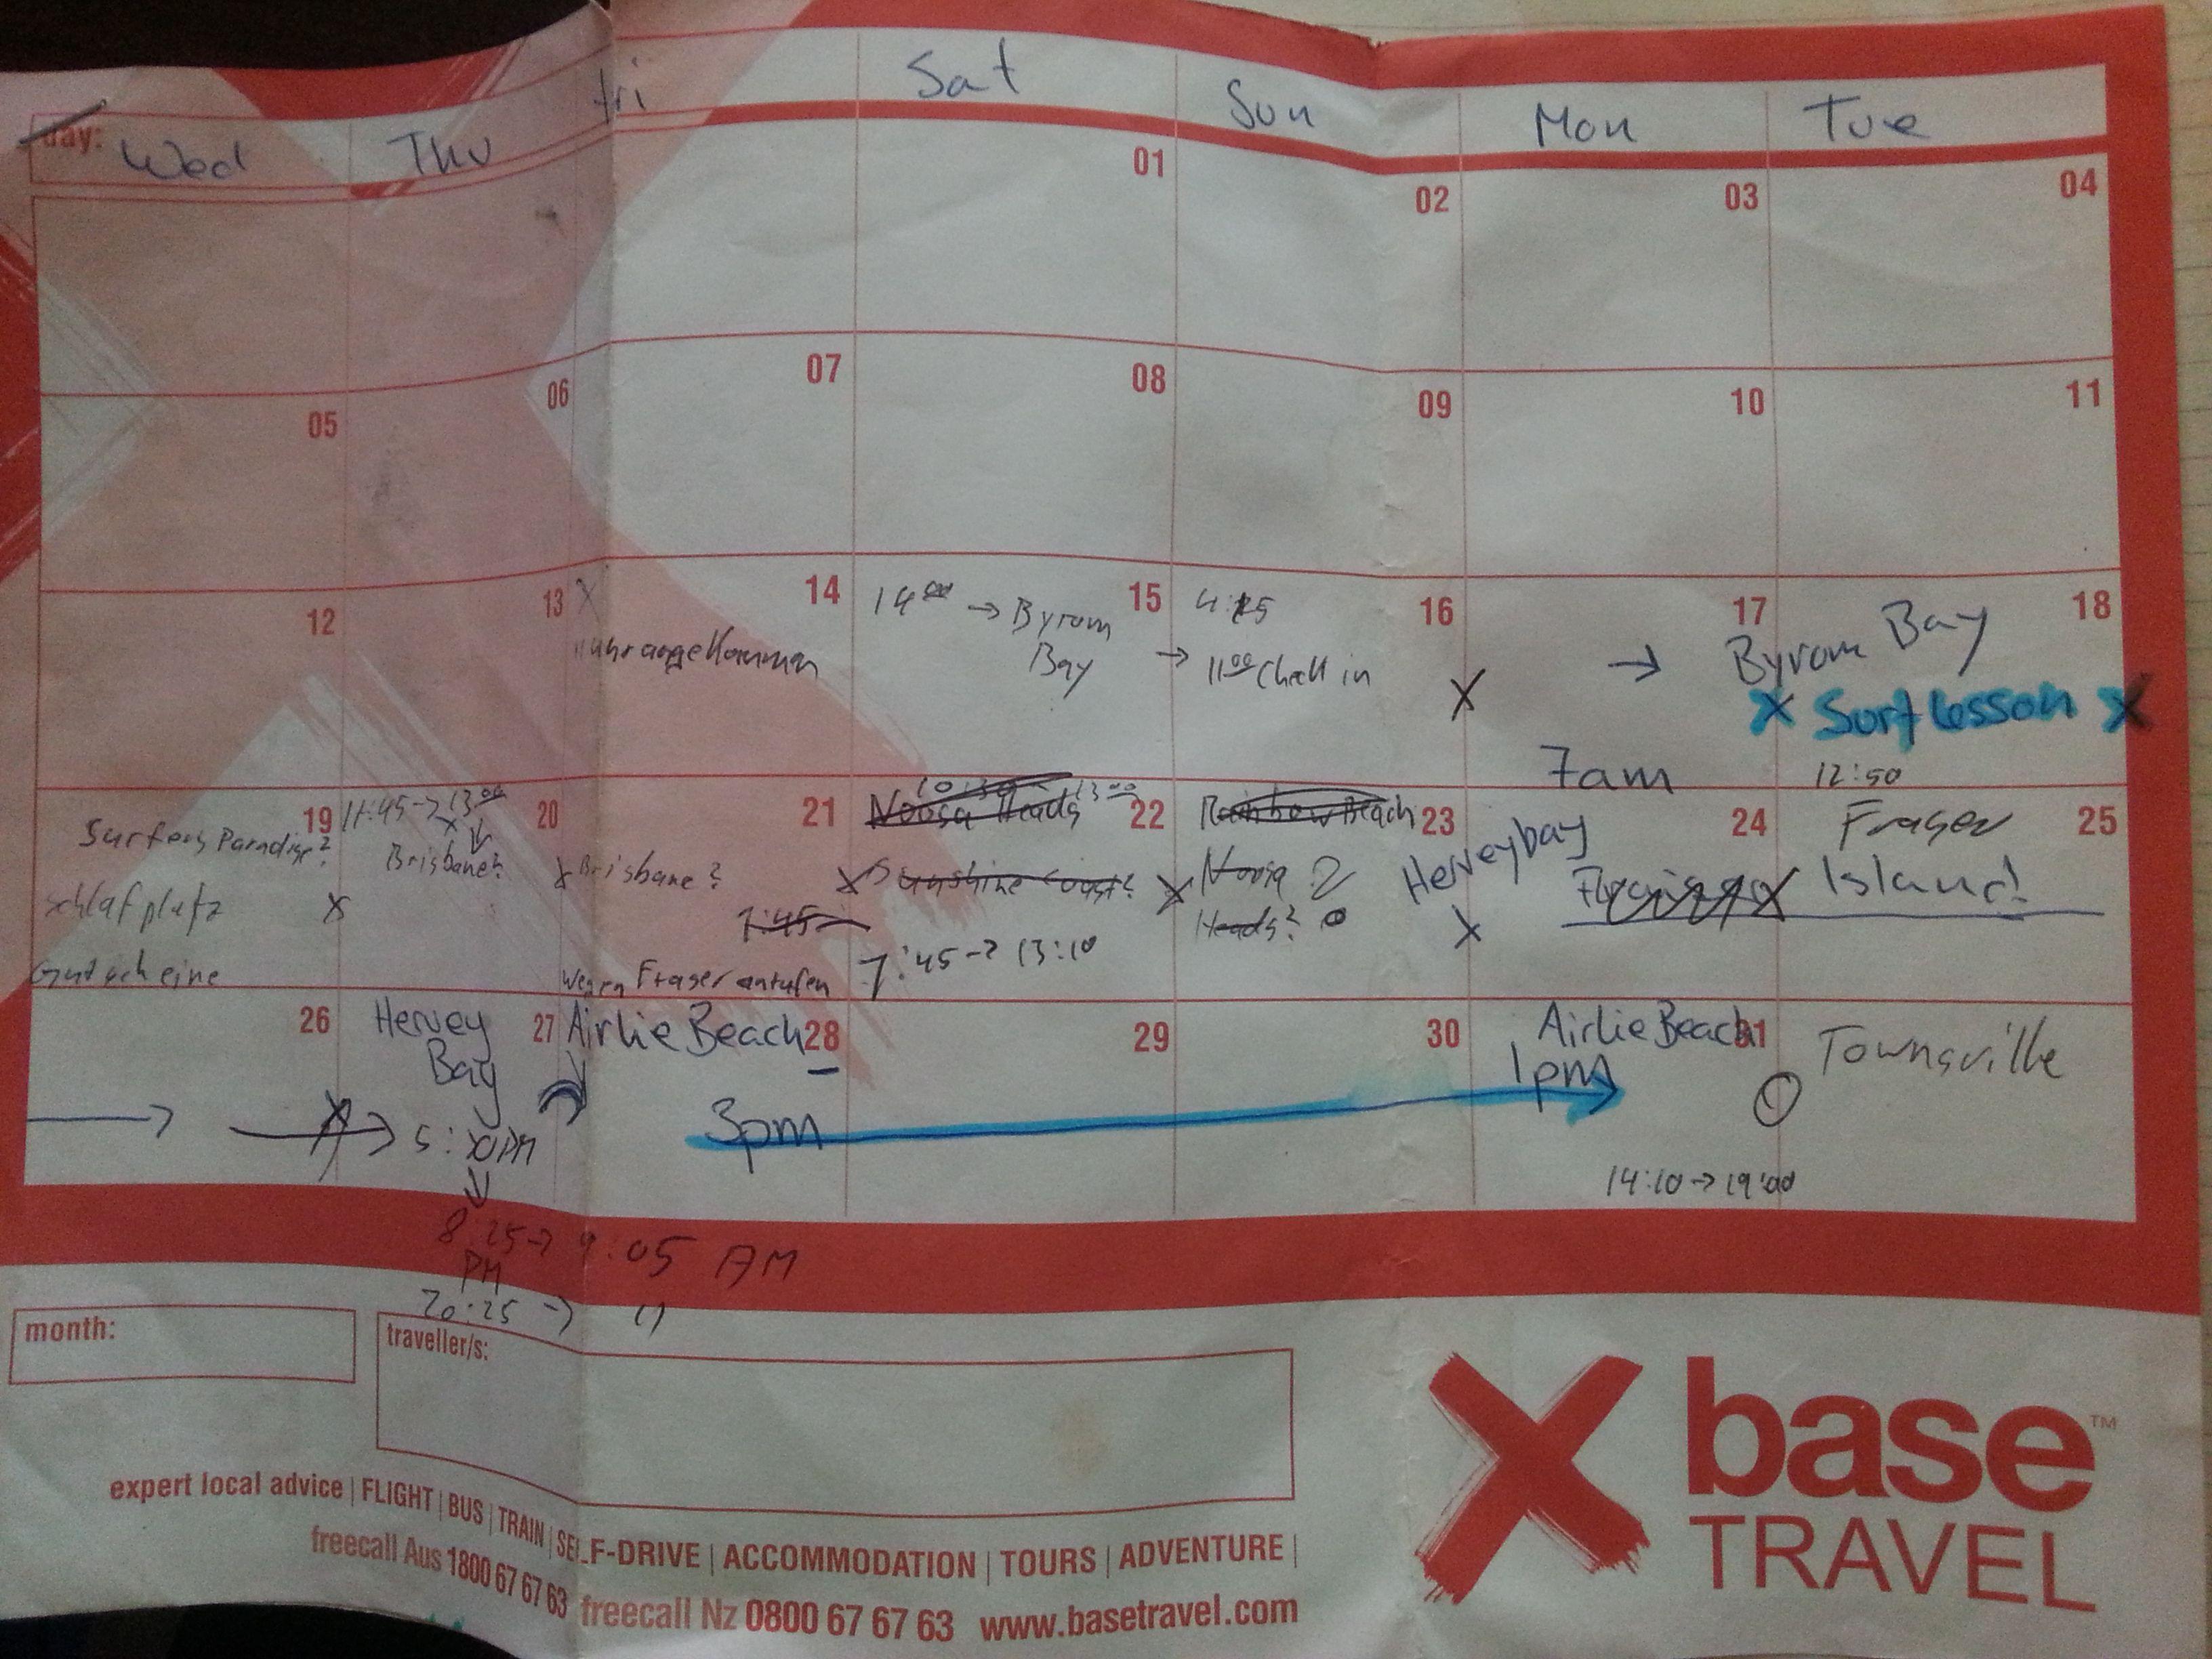 x-Base Sydney | Australientrip planung Seite 1